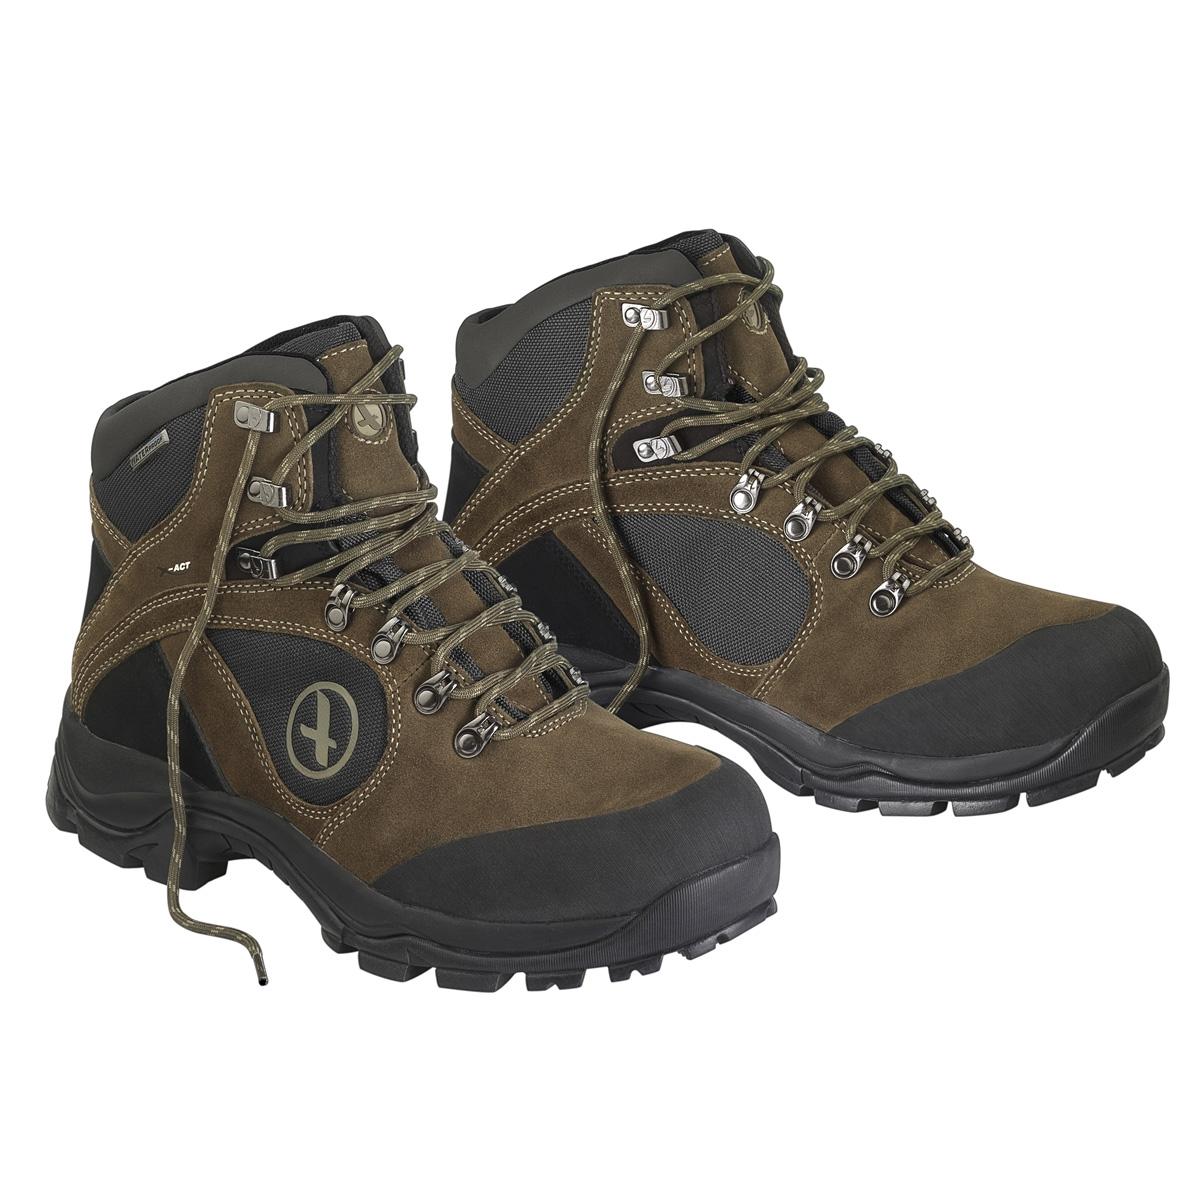 97a6e0e8c74b27 Aigle Hiking Shoes Cheap Sale Real Discount Official Amazon Cheap Online  84NC2aGJP